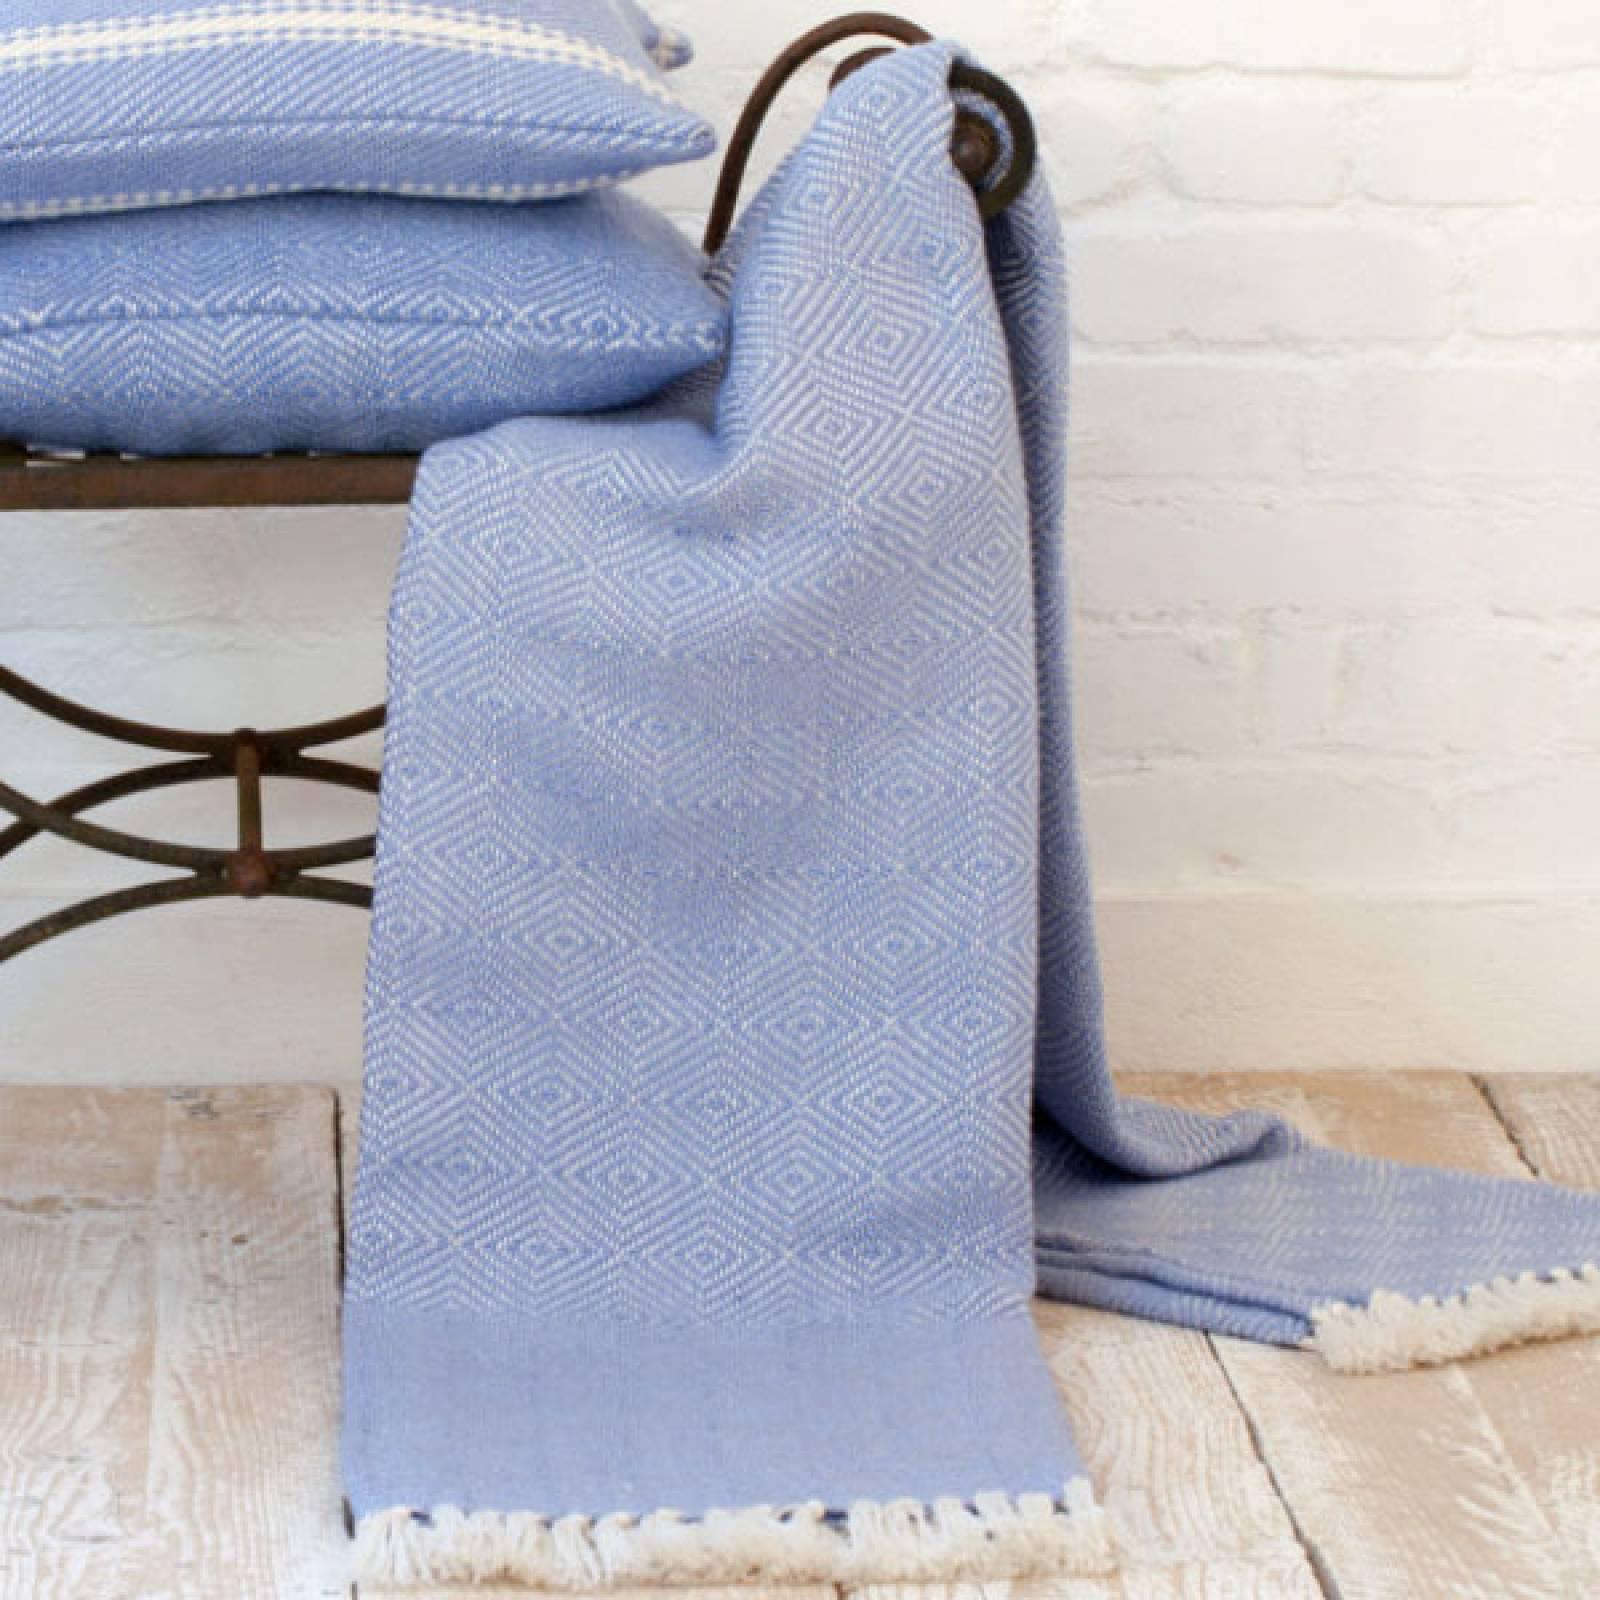 Cobalt Blanket From Recycled Bottles thumbnails